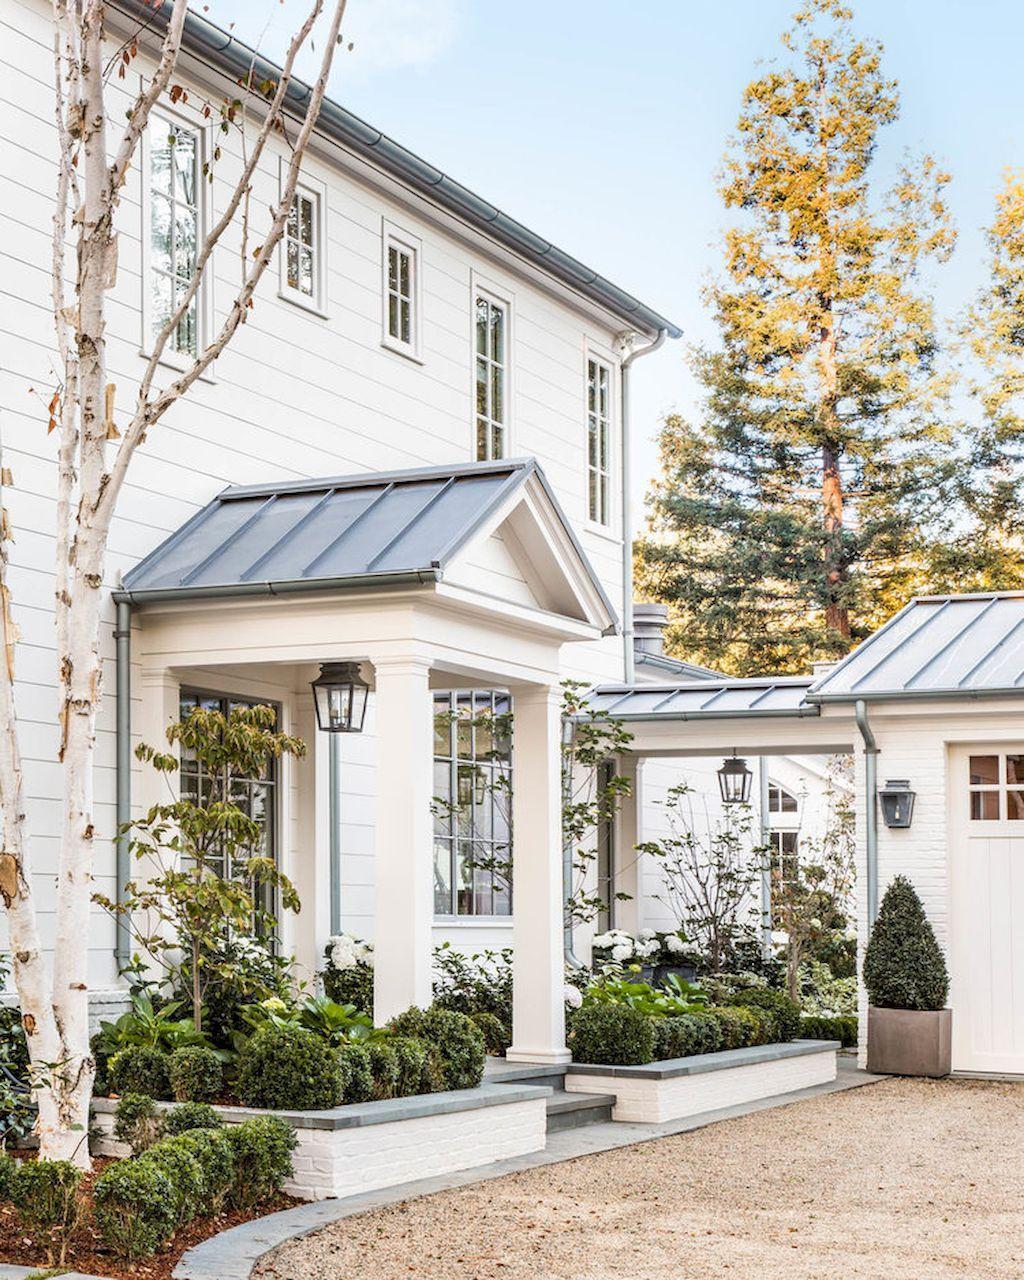 70 stunning farmhouse exterior design ideas (51 | Exterior design ...